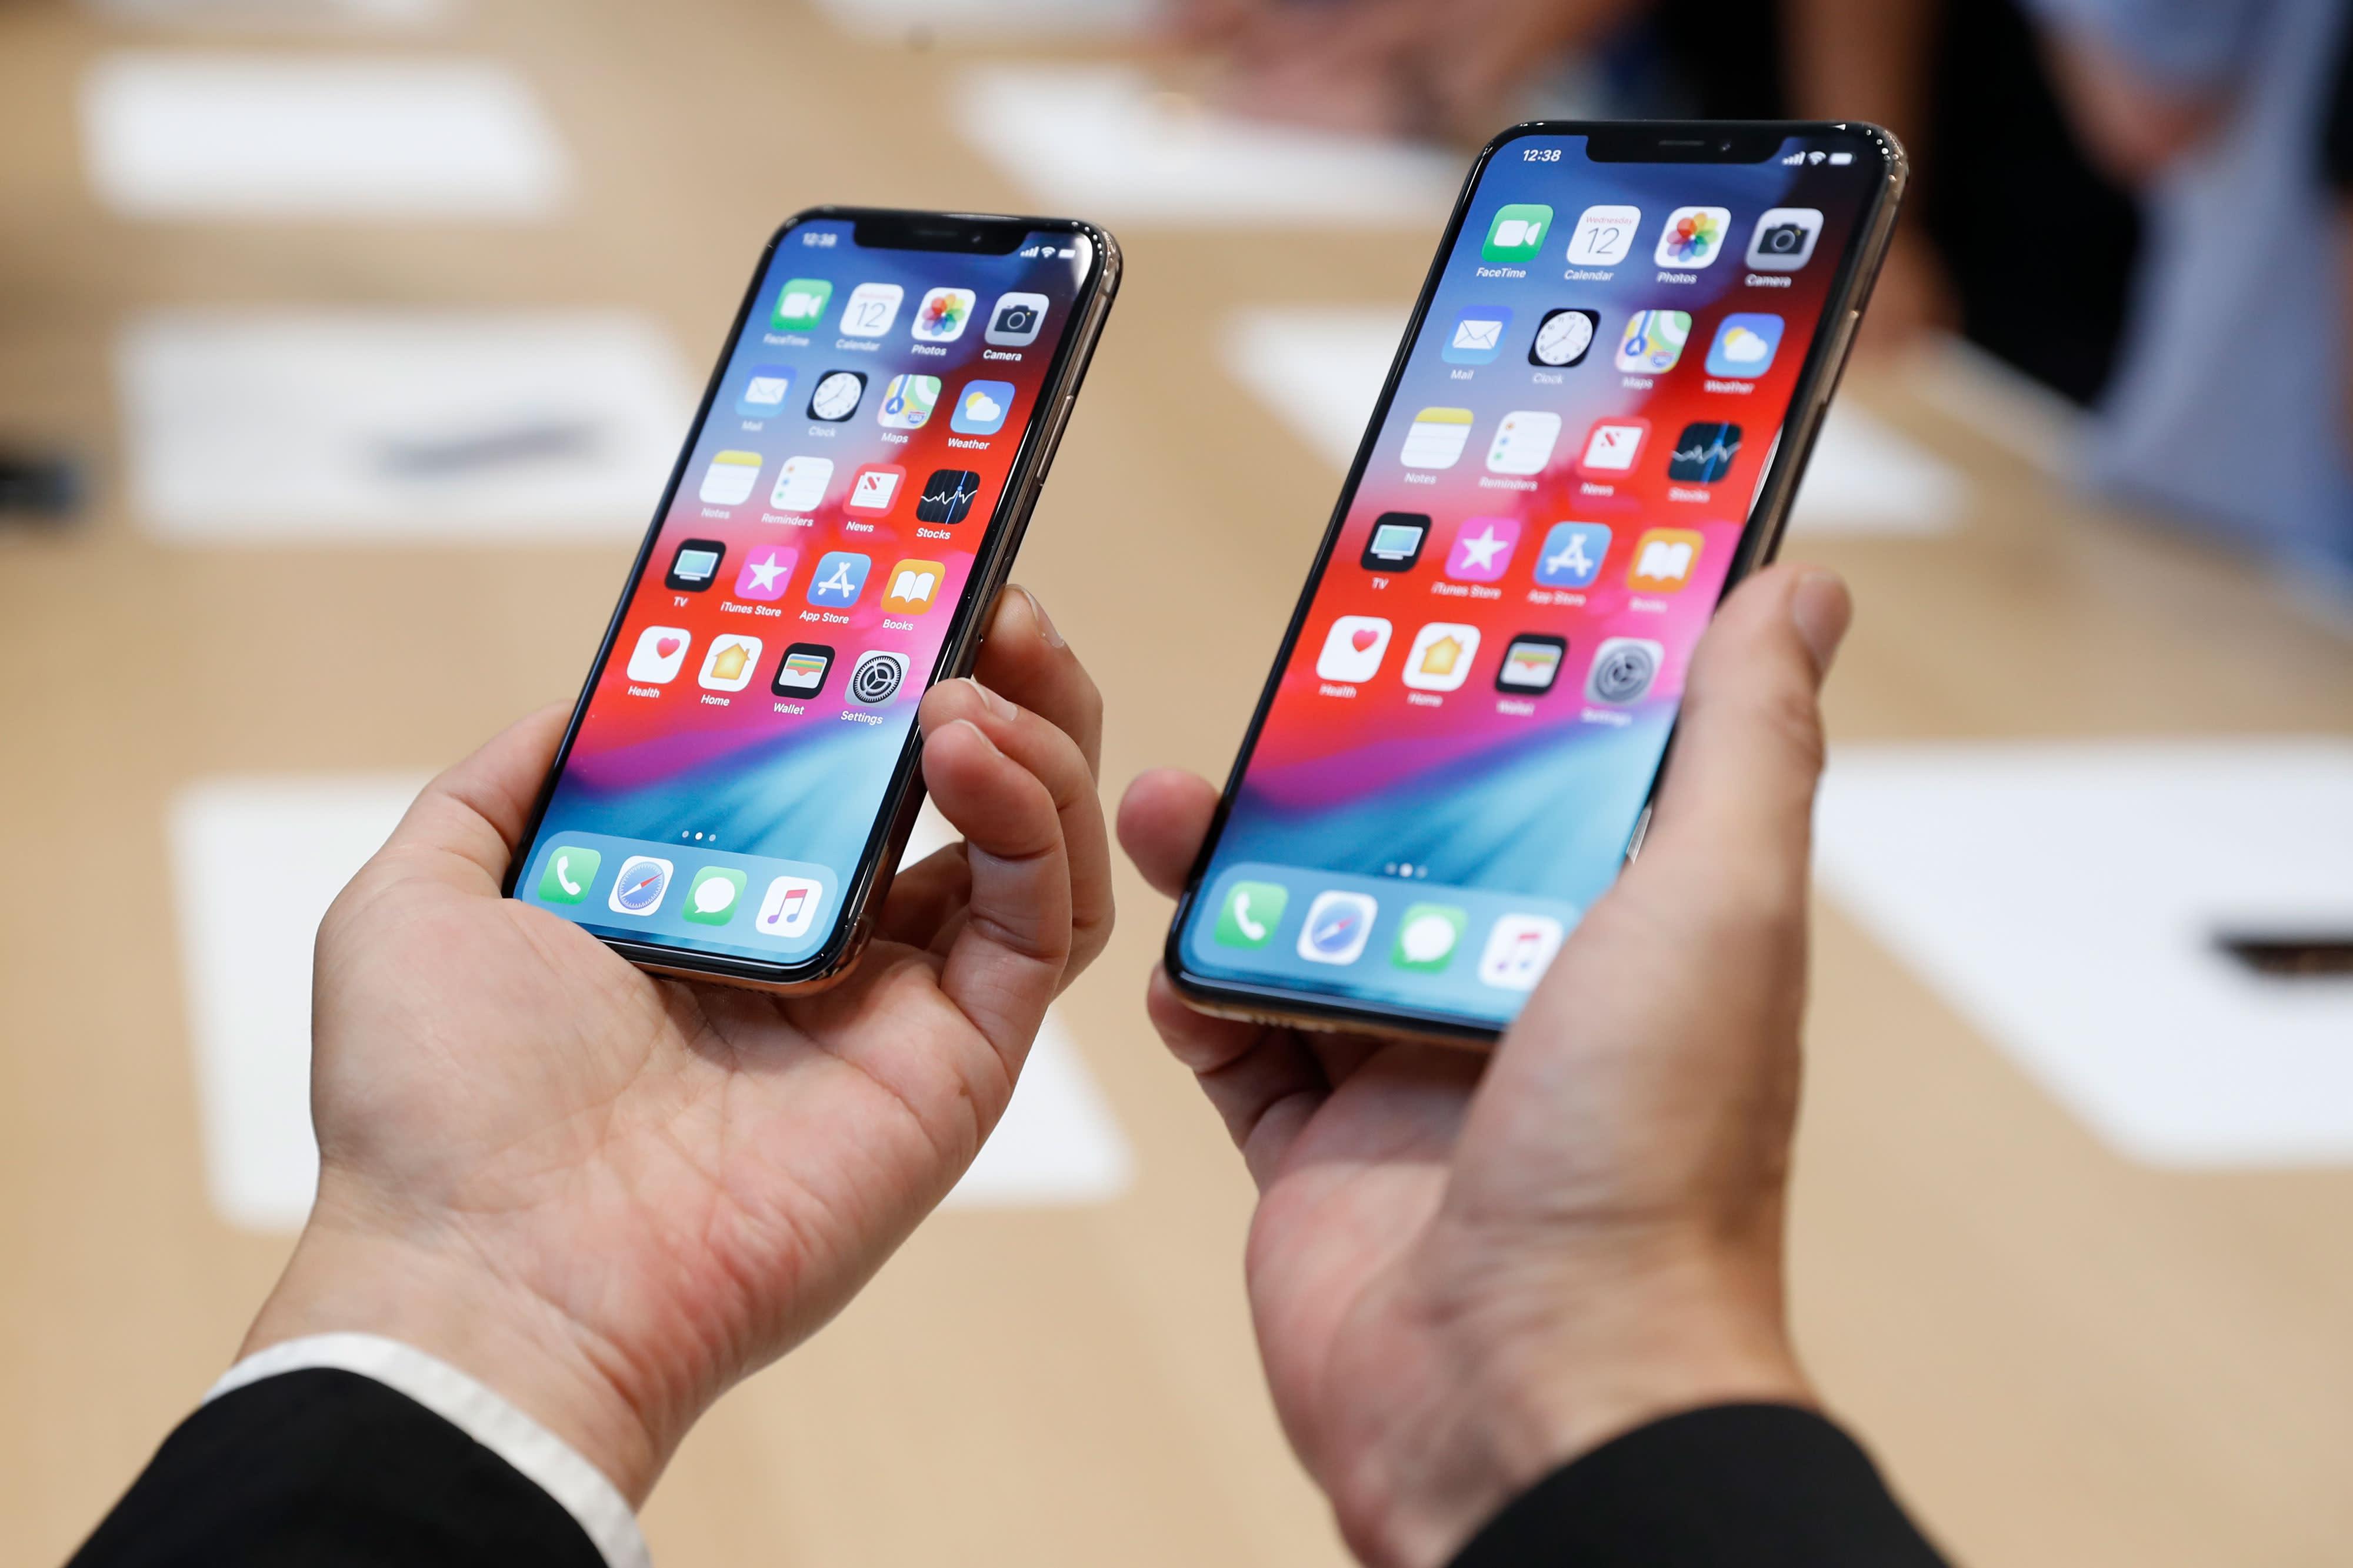 Apple announces iPhone XS, iPhone XS Max, iPhone XR: price